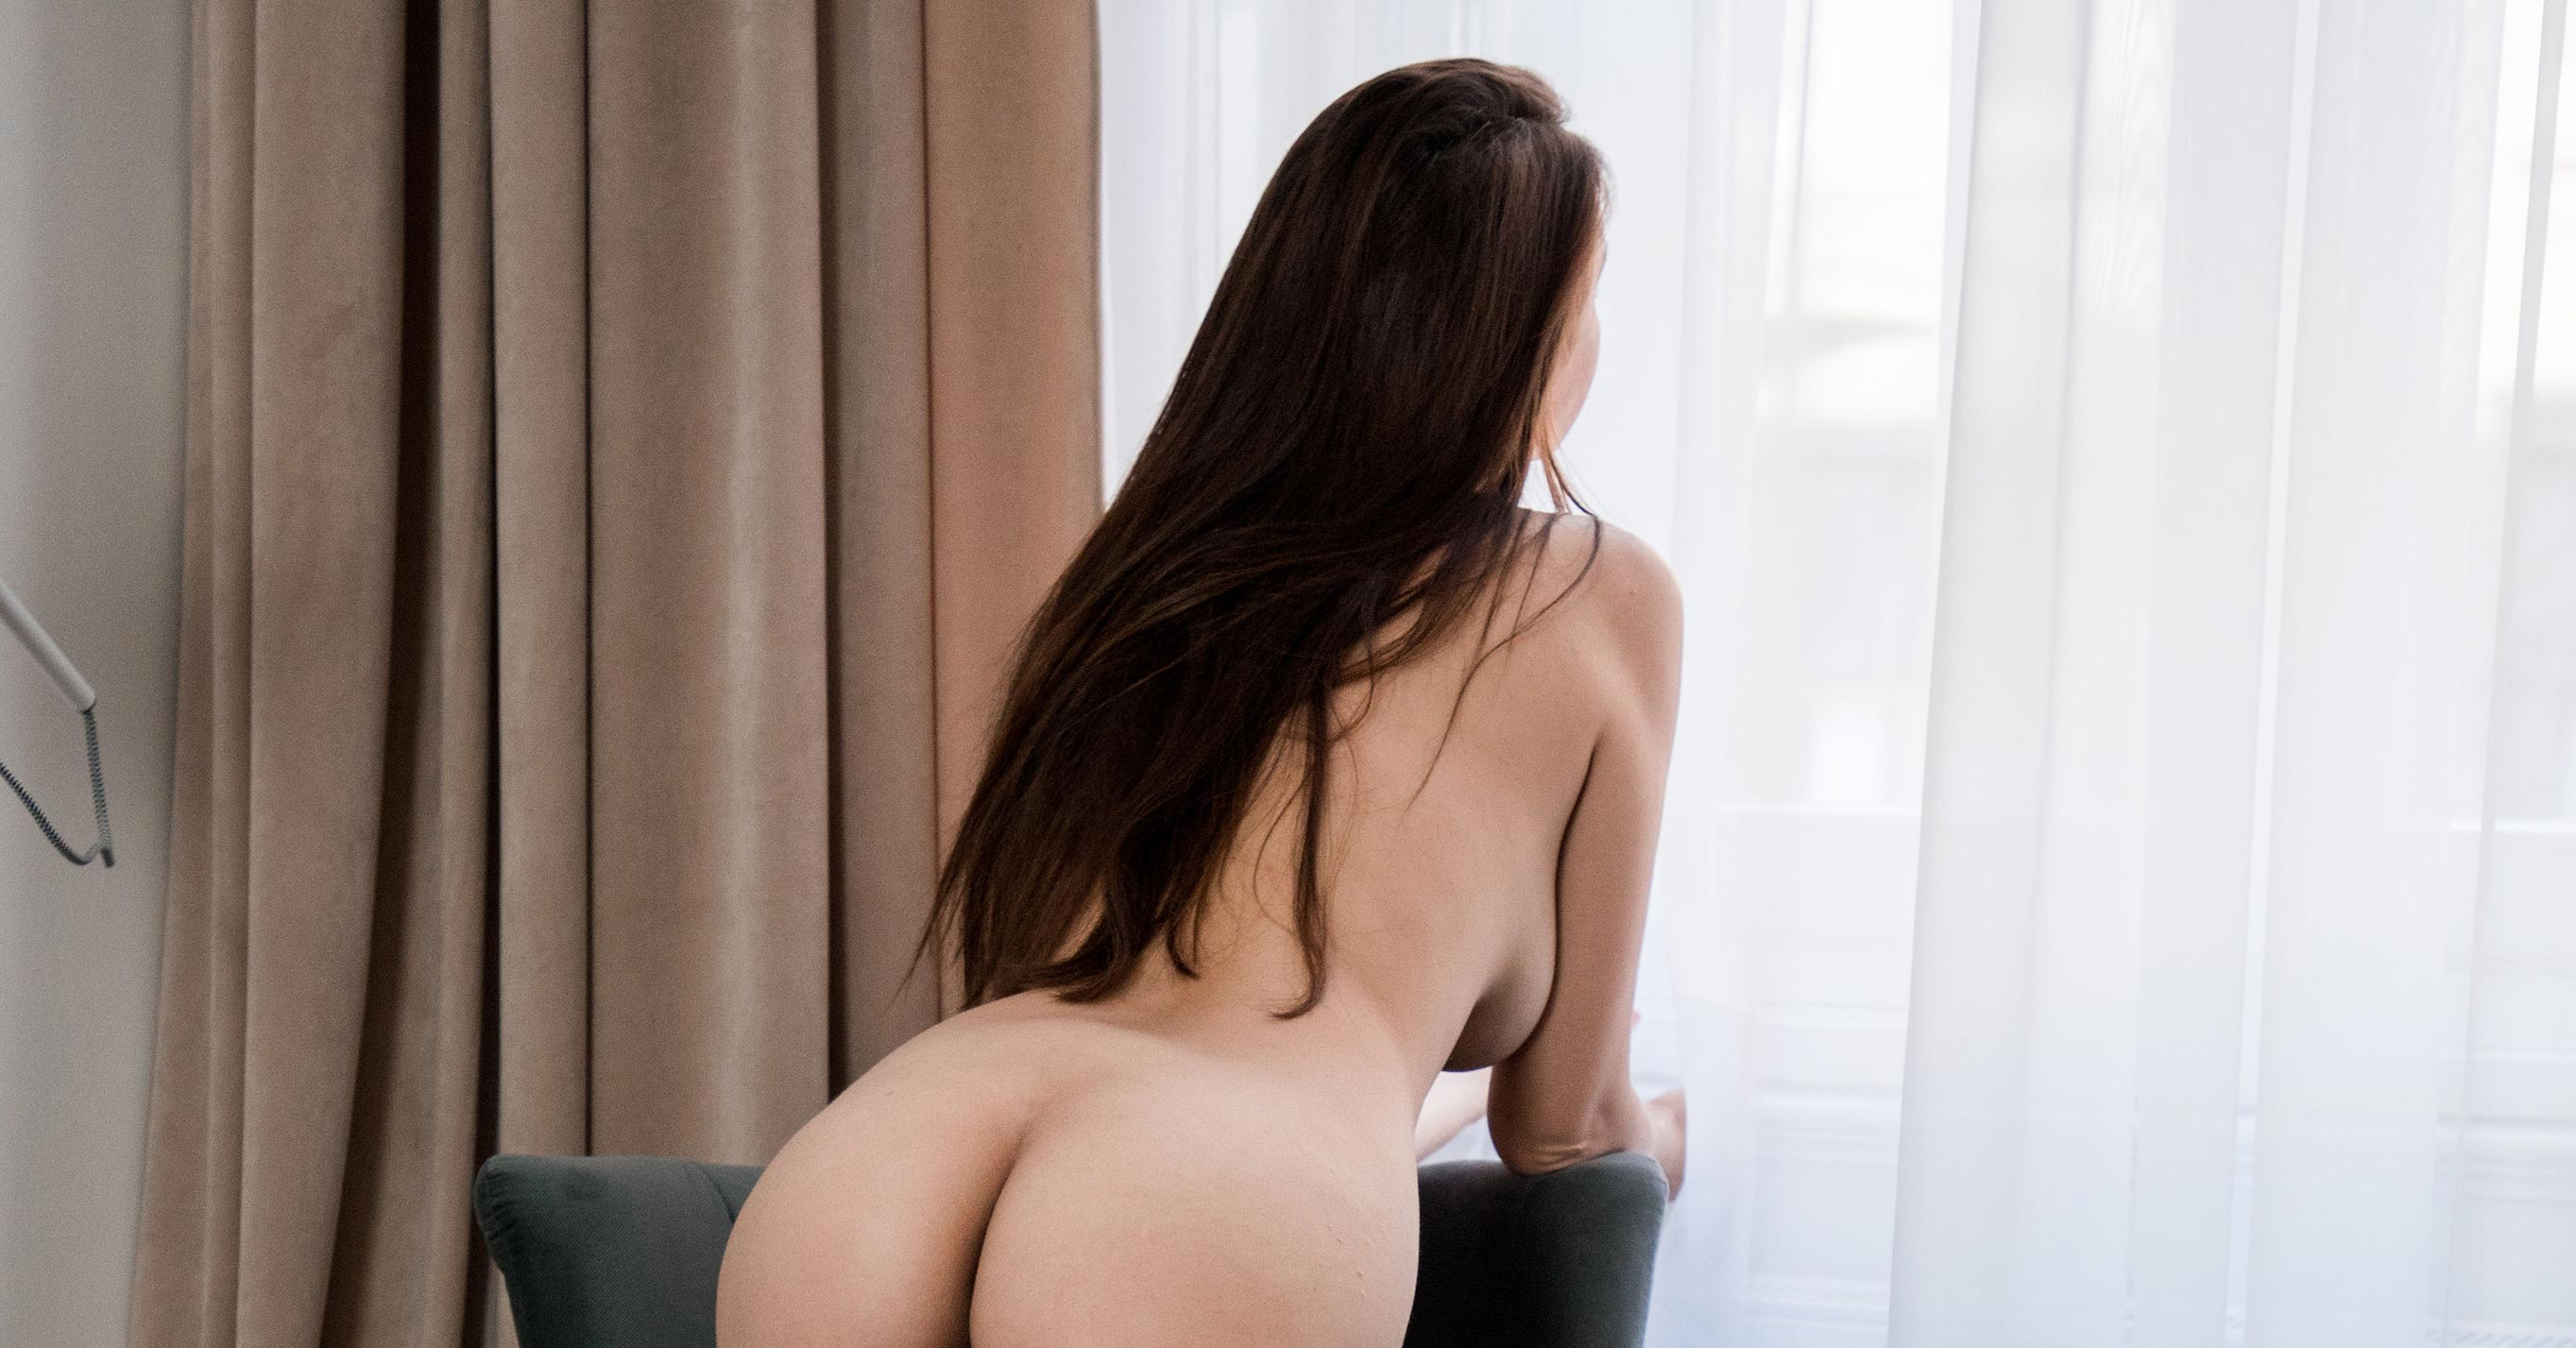 Навстречу новому дню - голая Алиса у окна / фото 16